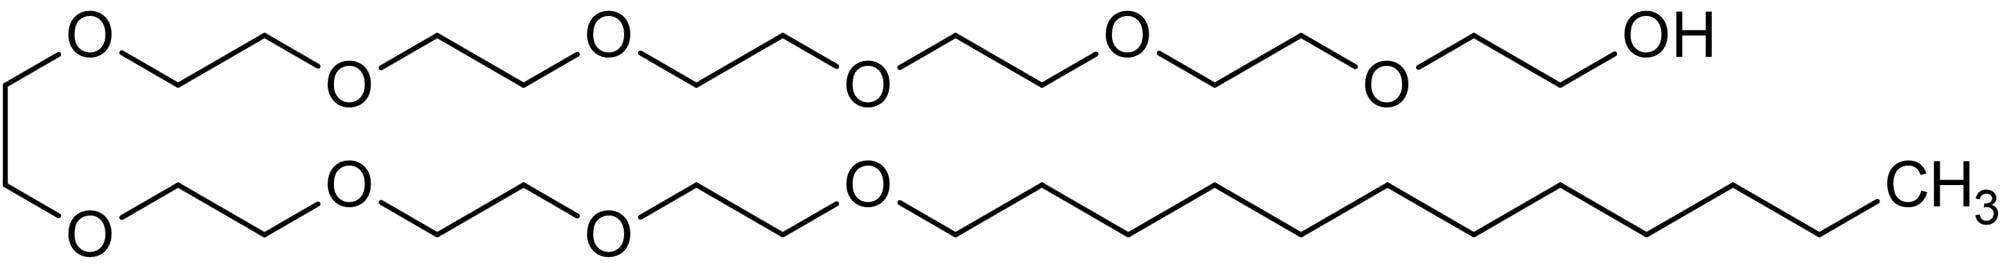 Chemical Structure - C12 E10, non-ionic surfactant (ab146563)